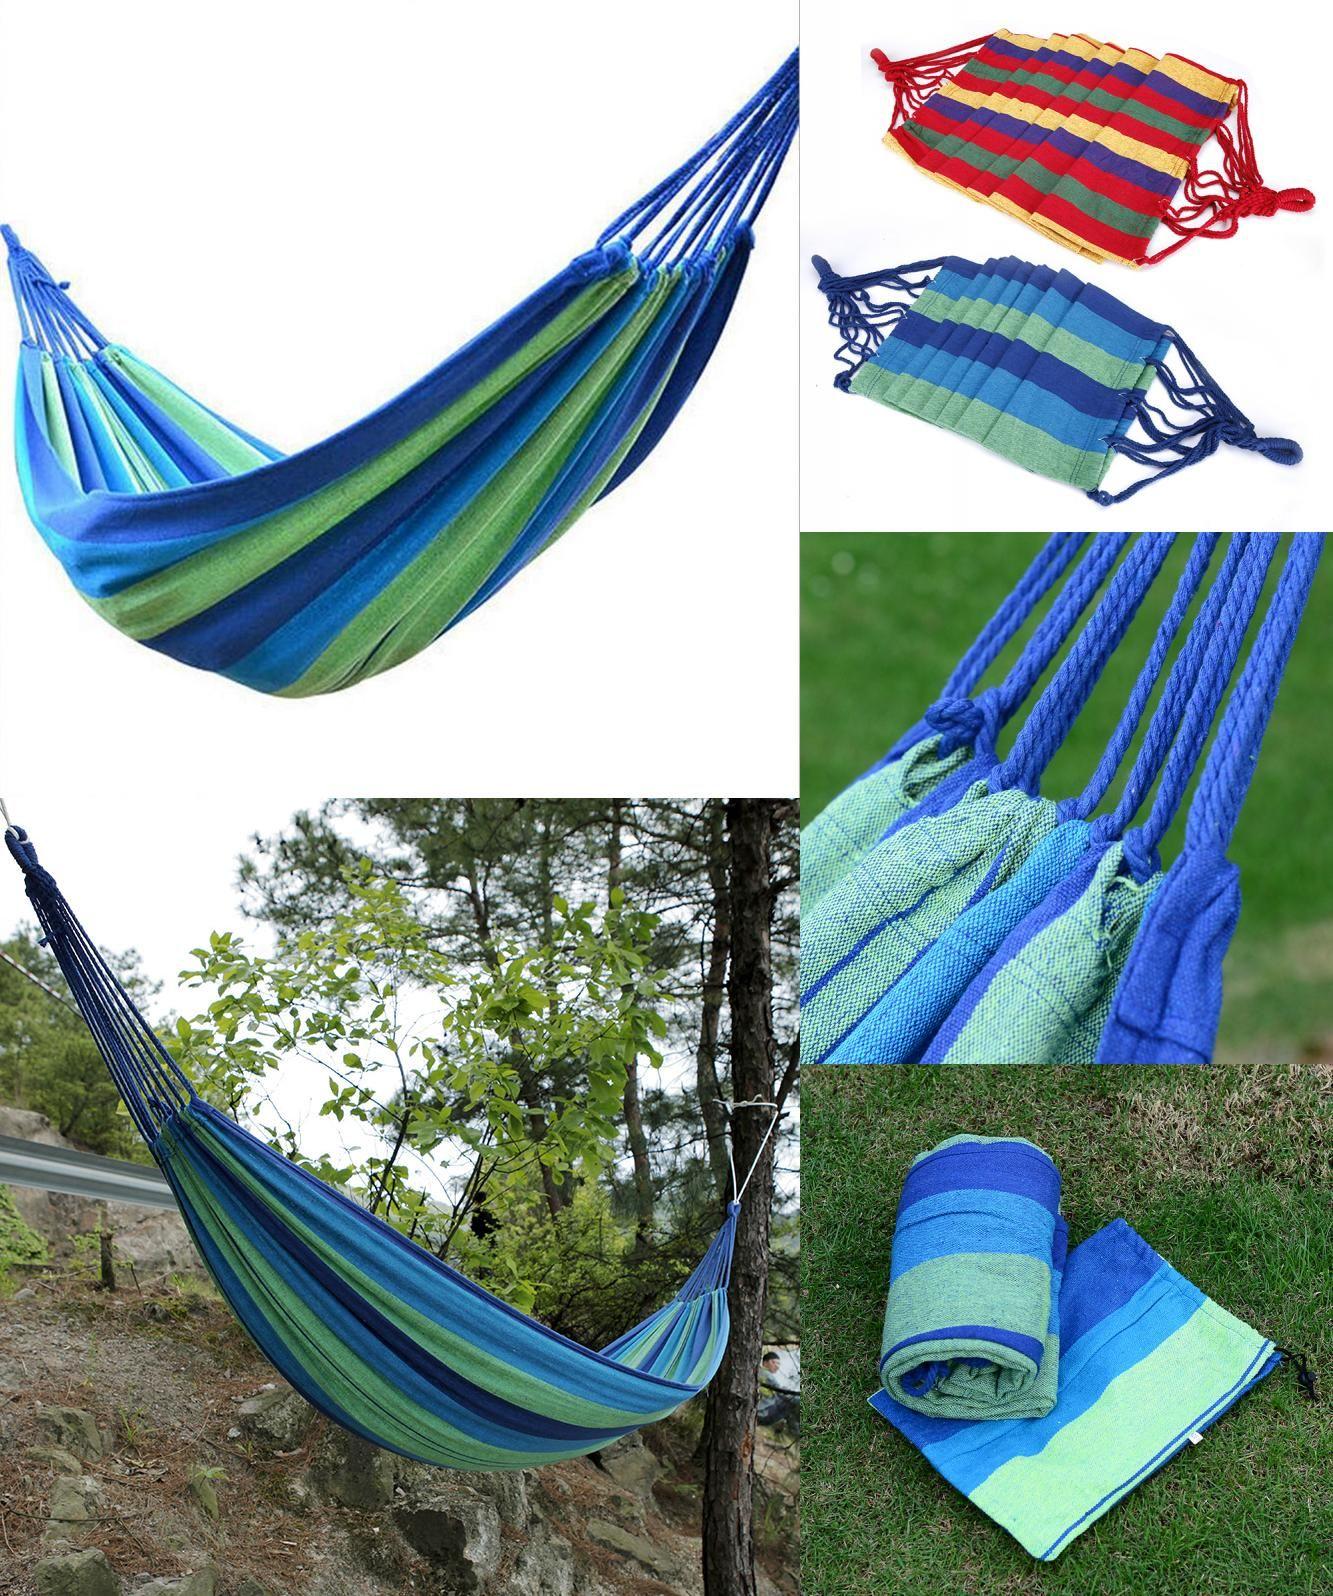 [Visit to Buy] Outdoor Garden Hammock Portable Hang BED